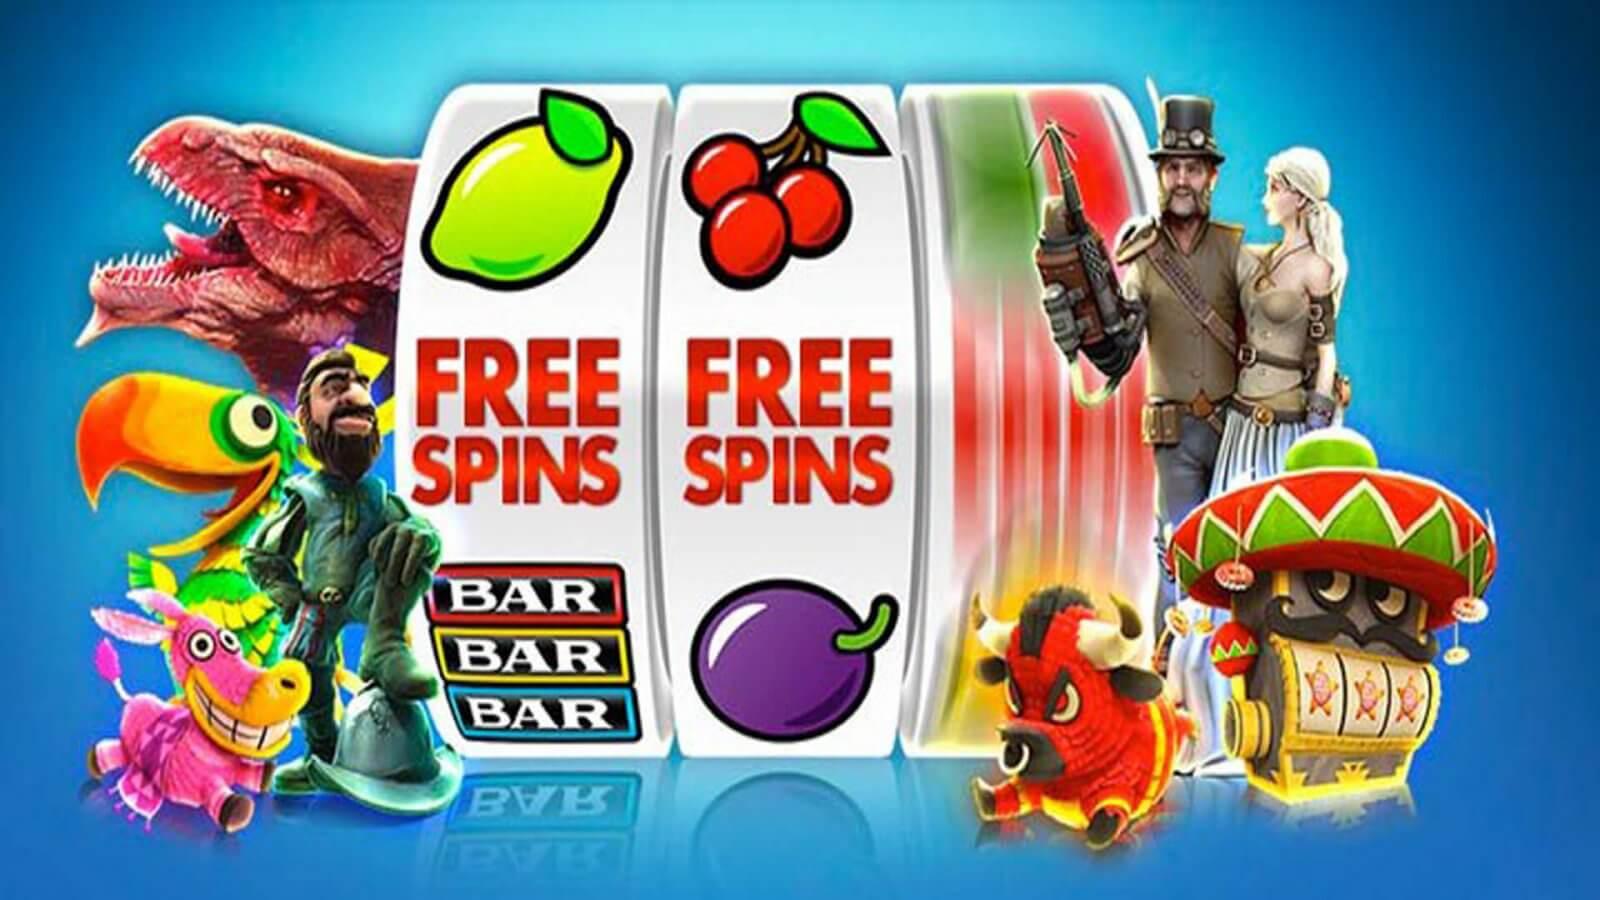 free spins в онлайн казино Украины